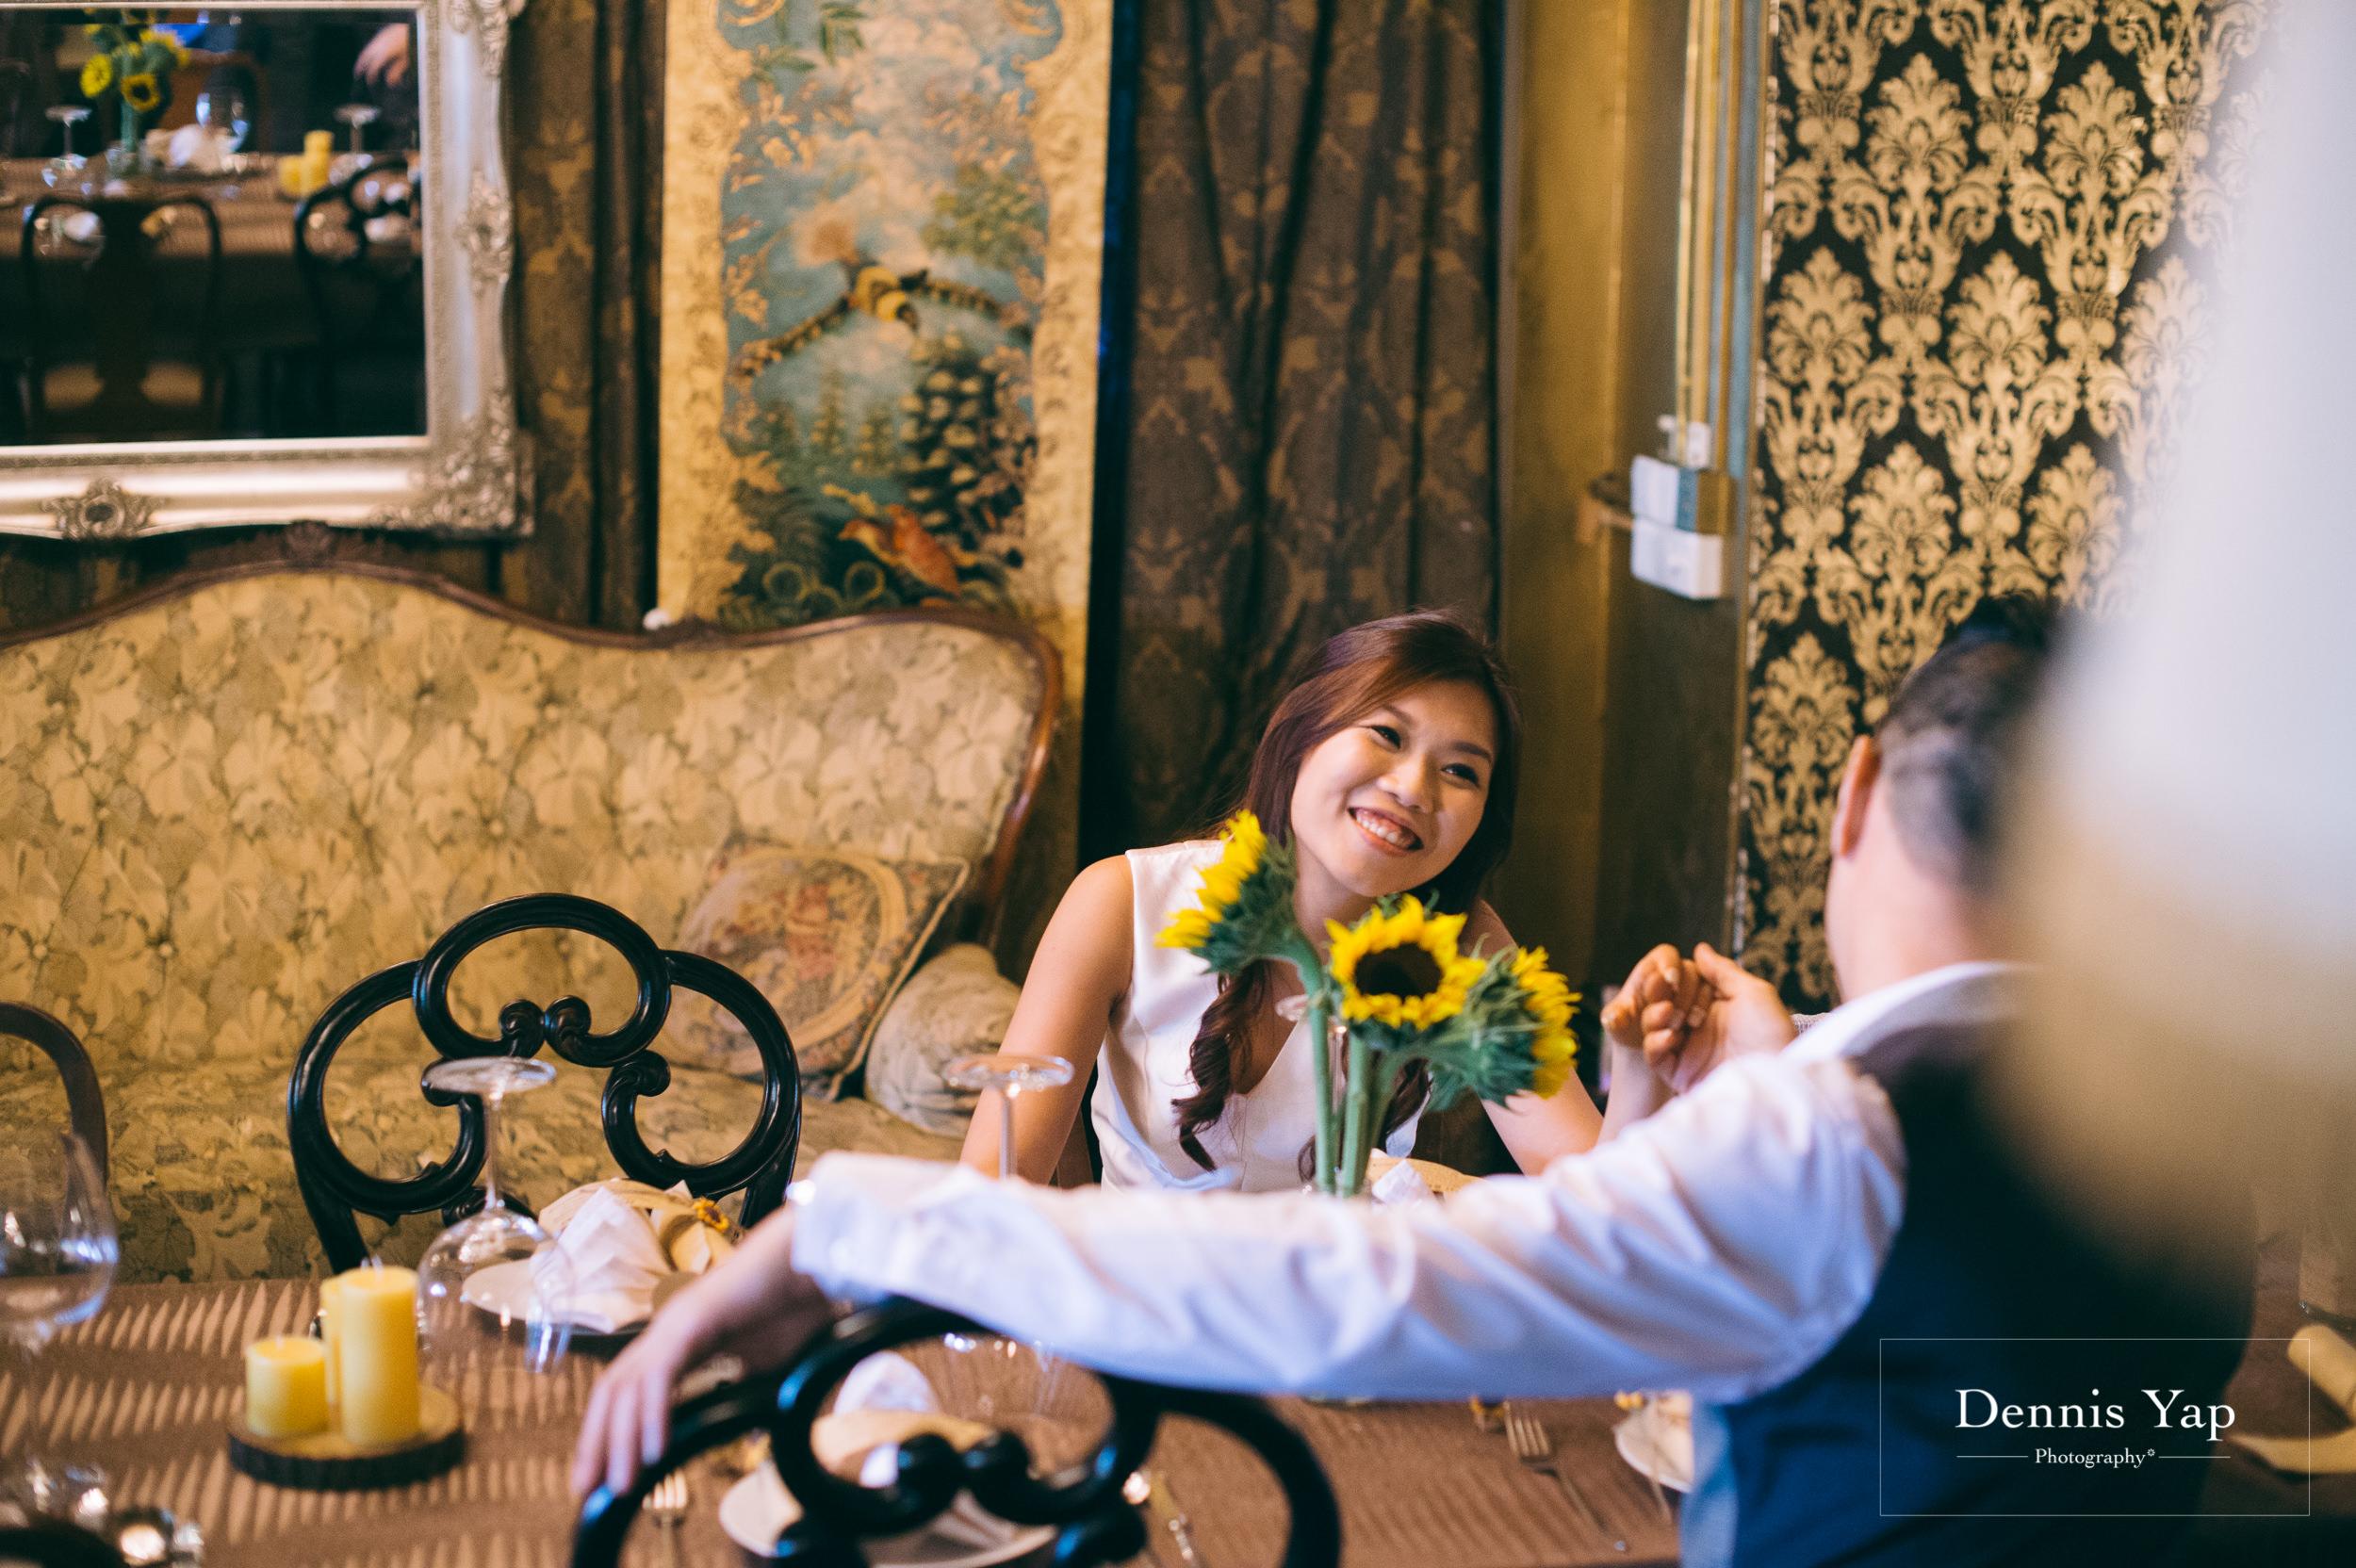 patrick samantha surprise wedding party cafe cafe kuala lumpur dennis yap photography-7.jpg